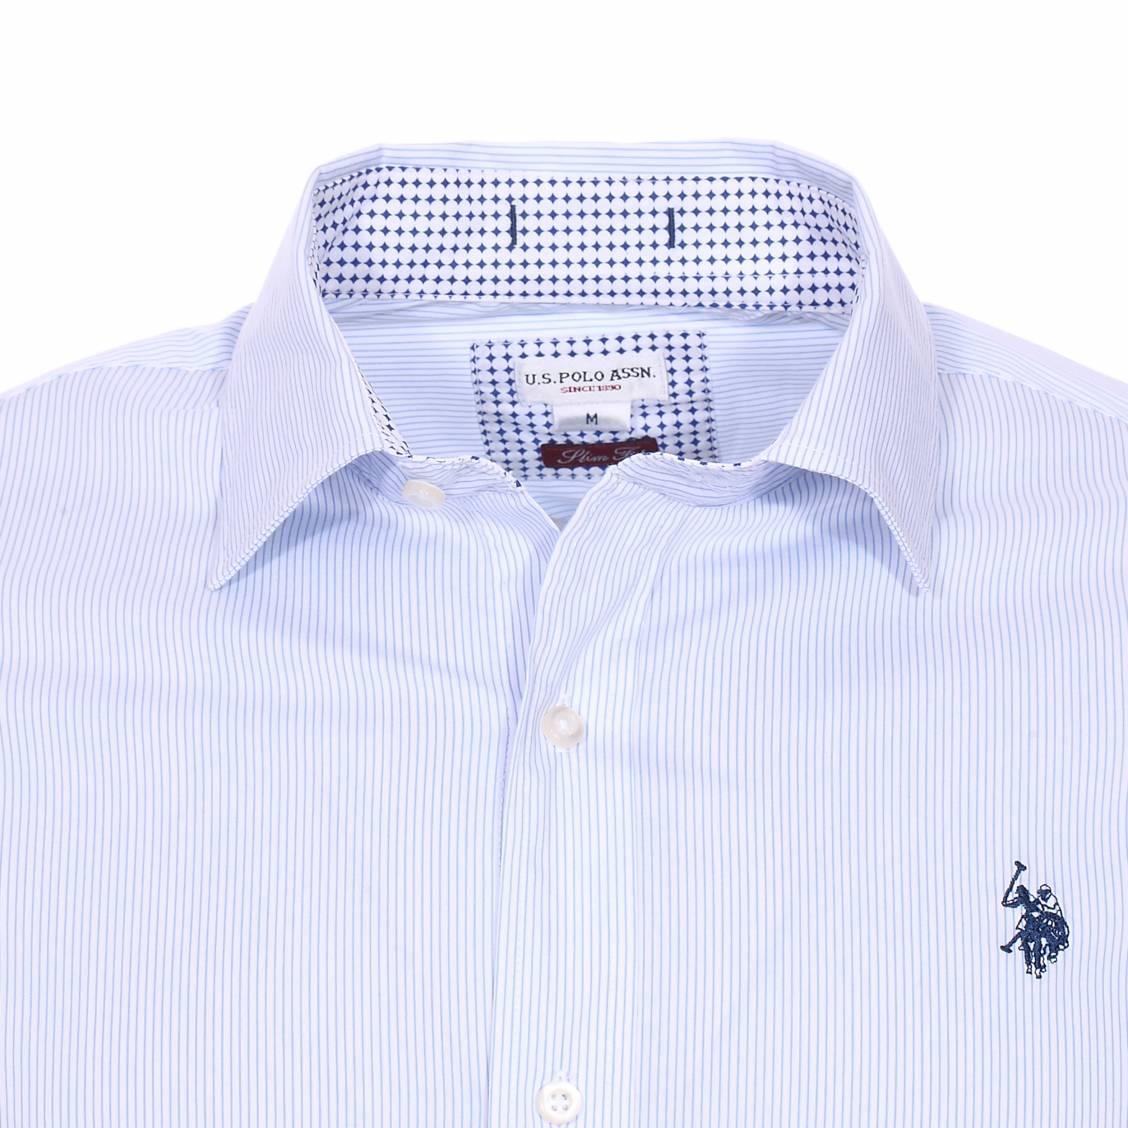 Chemise Cintree U S Polo Assn Octavi En Coton Stretch Blanc A